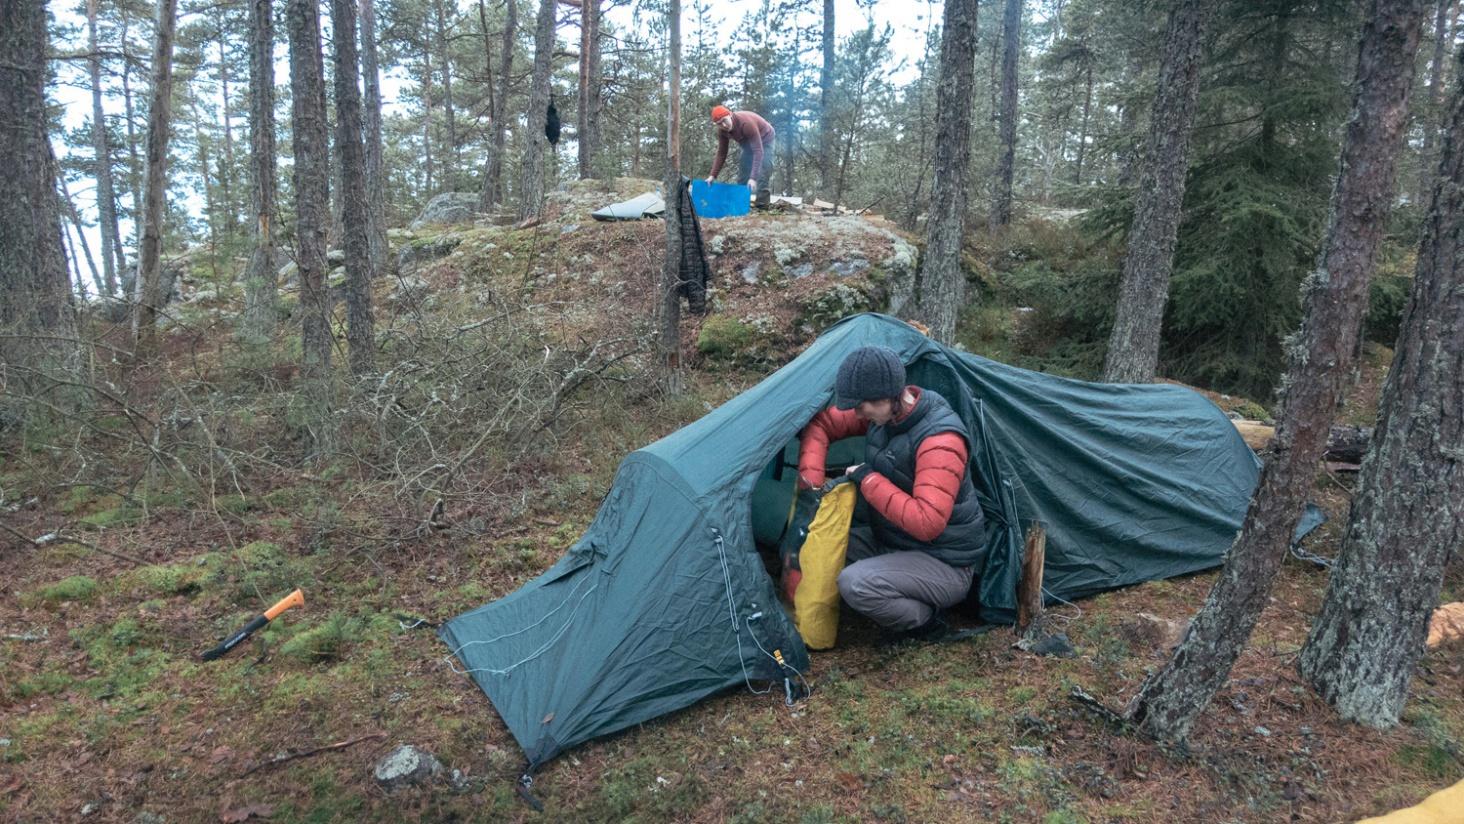 16 Robin Falck Finnland Kajak